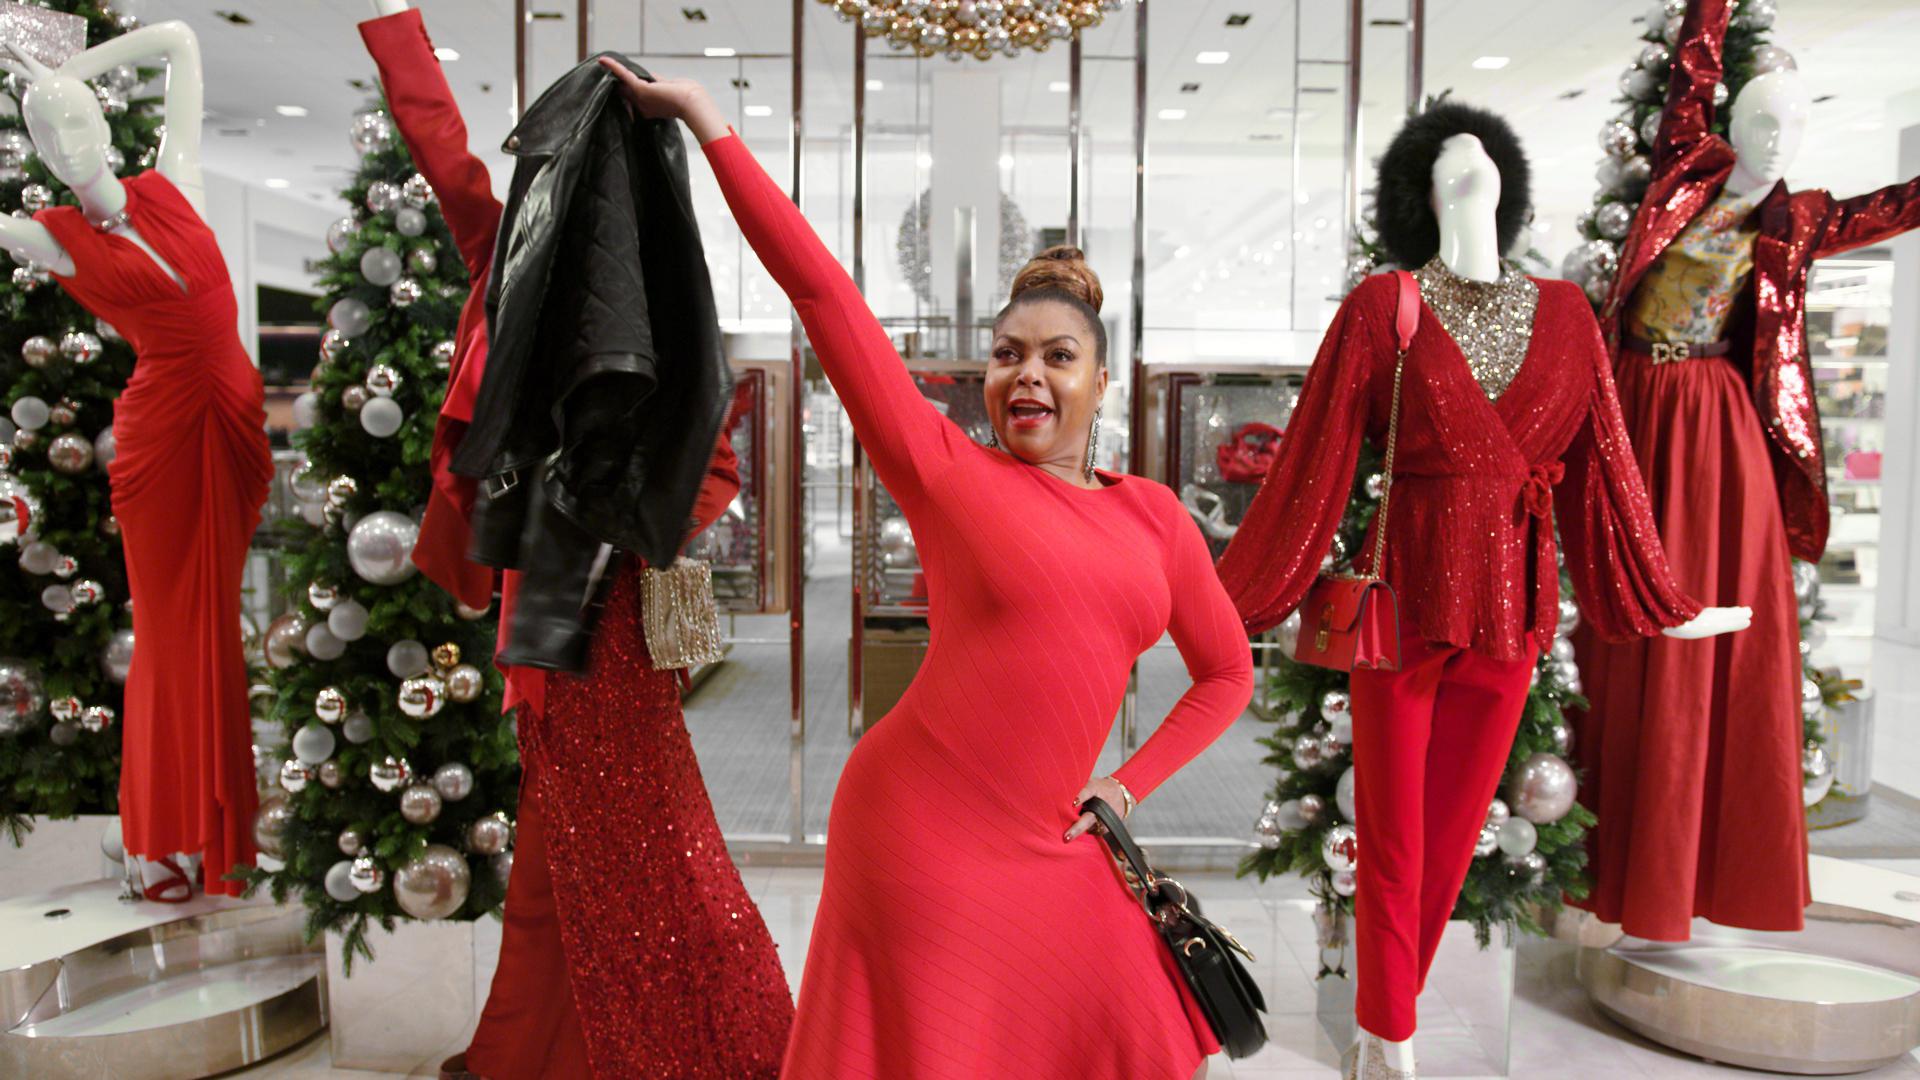 Taraji P Henson Spends the Night at Neiman Marcus this Holiday